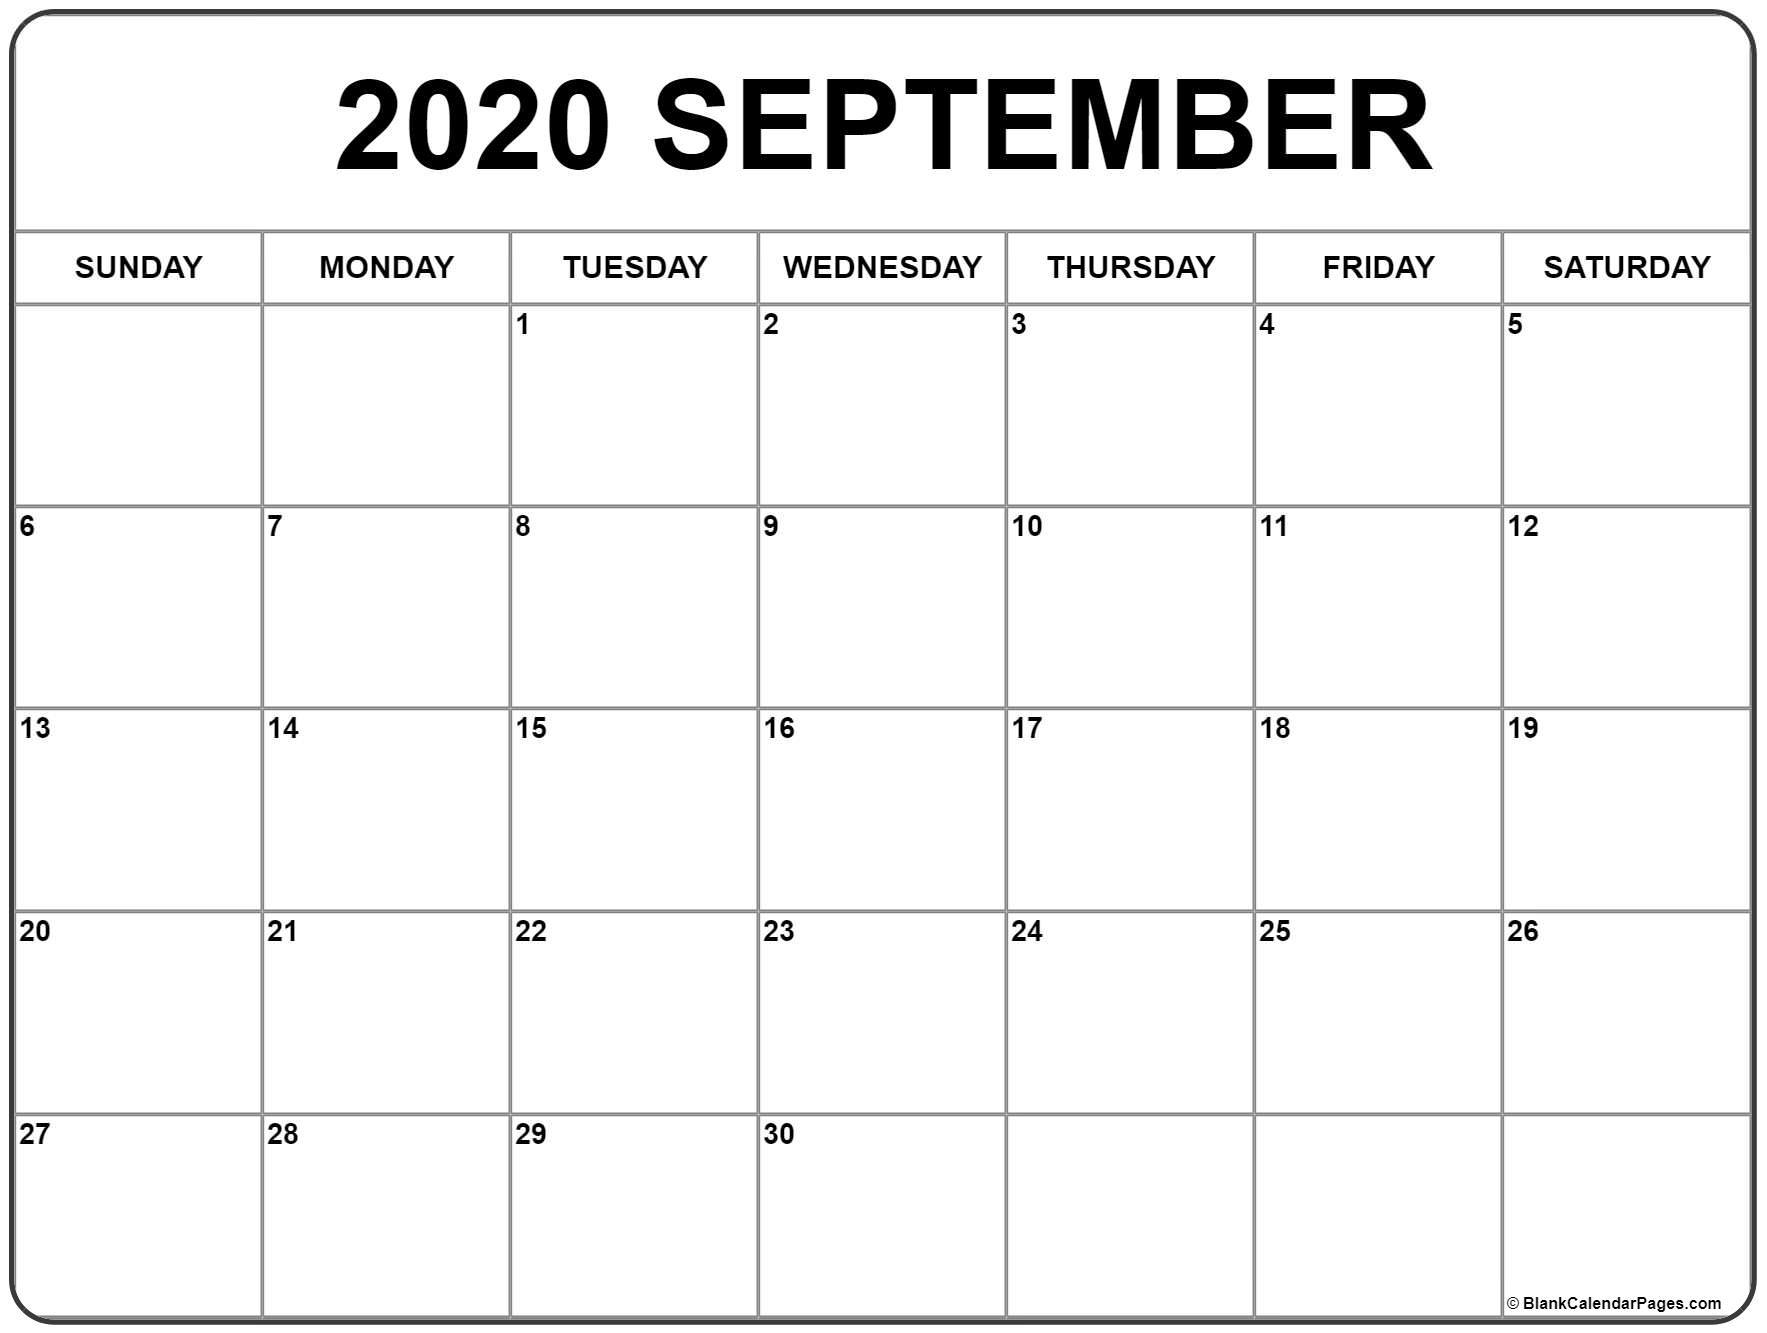 September 2020 Calendar | Free Printable Monthly Calendars